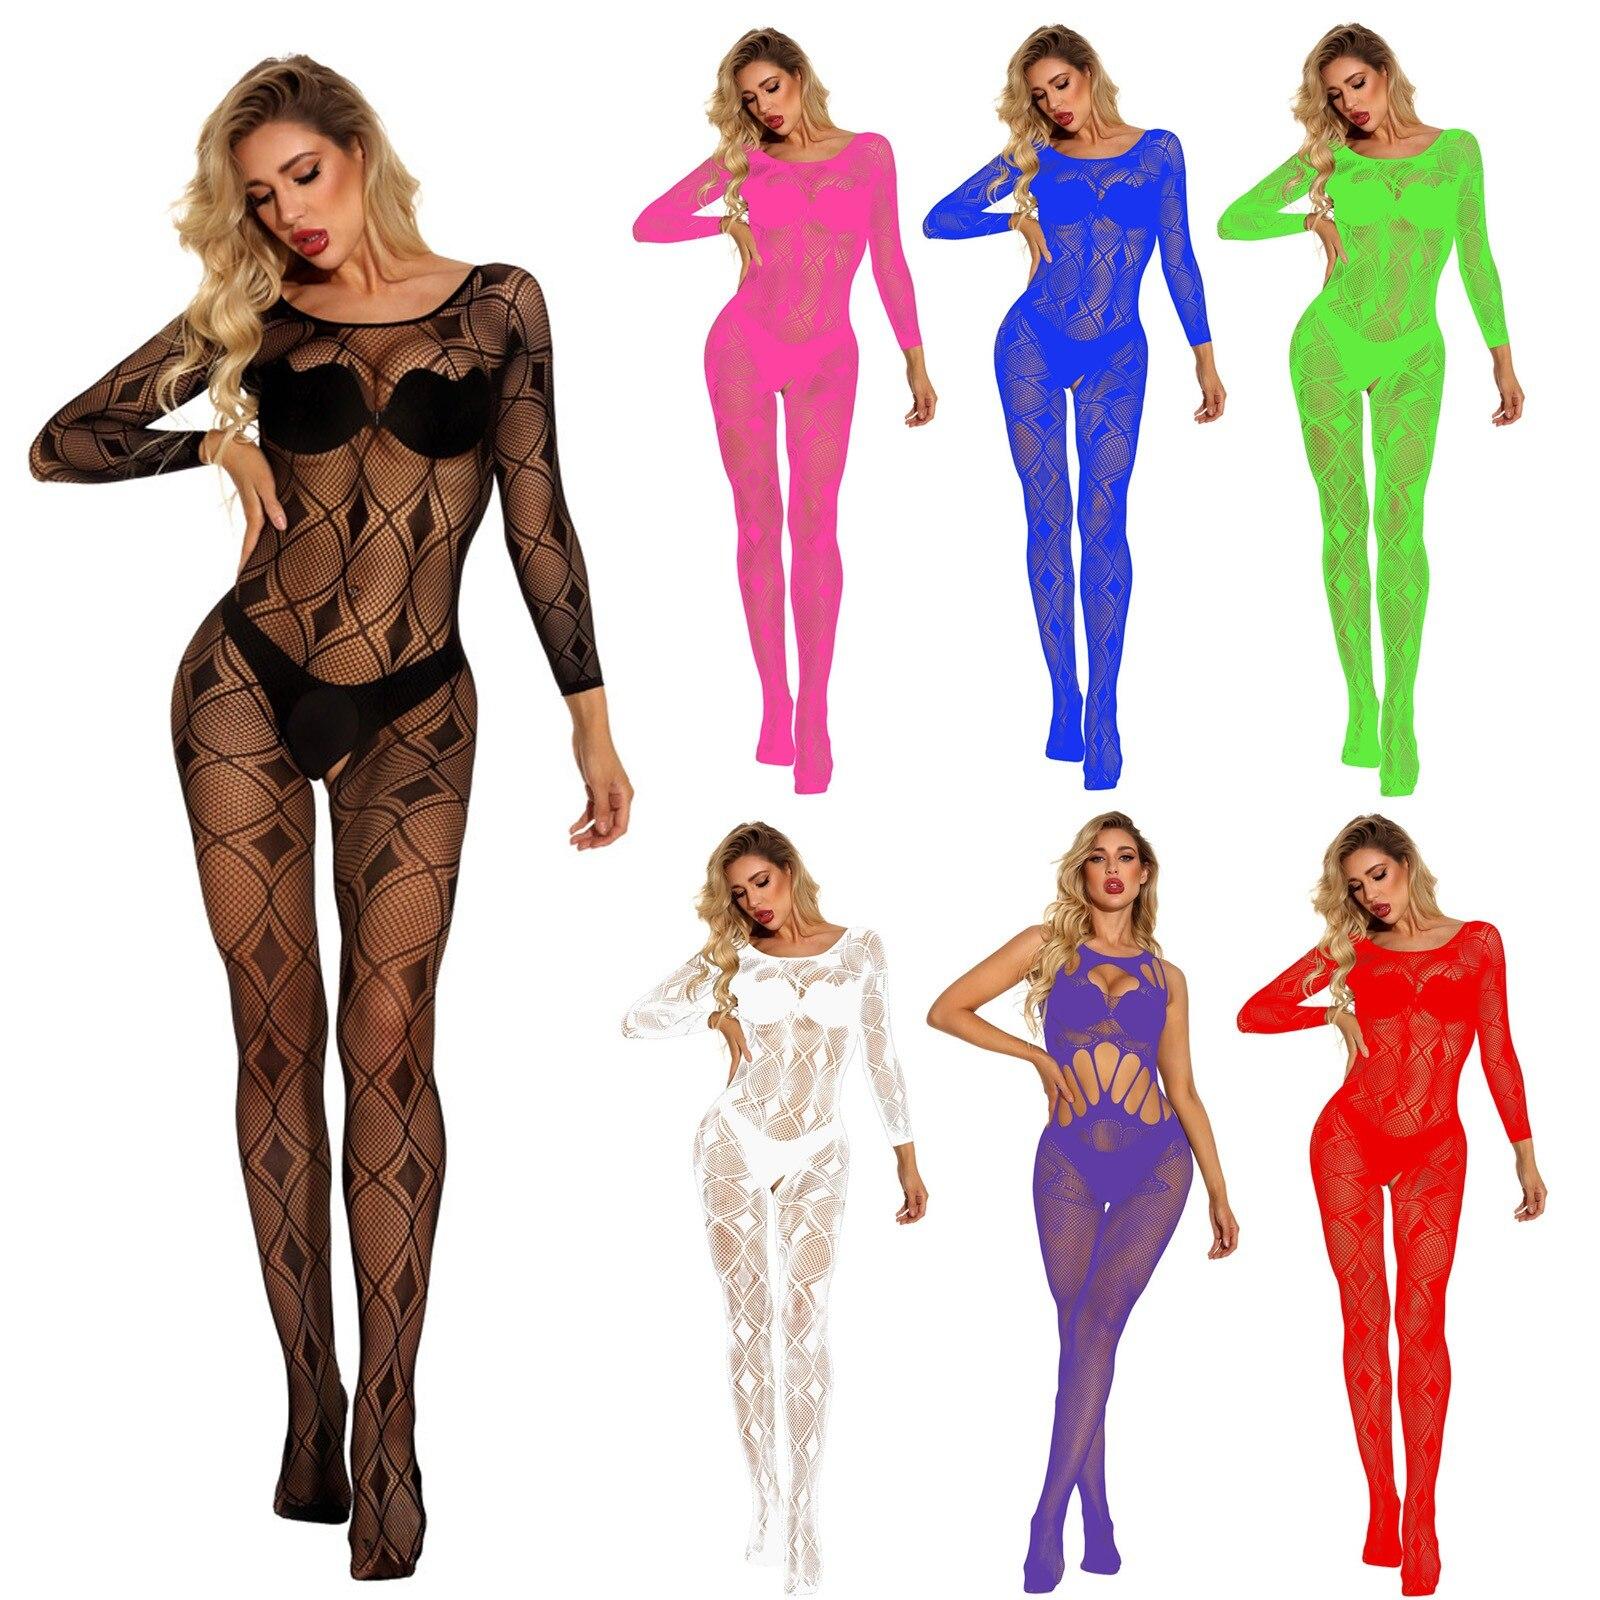 Plus Size Porno Lenceria Women Sleepwear Mesh Babydoll Open Crotch Lingerie Sexy Hot Erotic Costumes